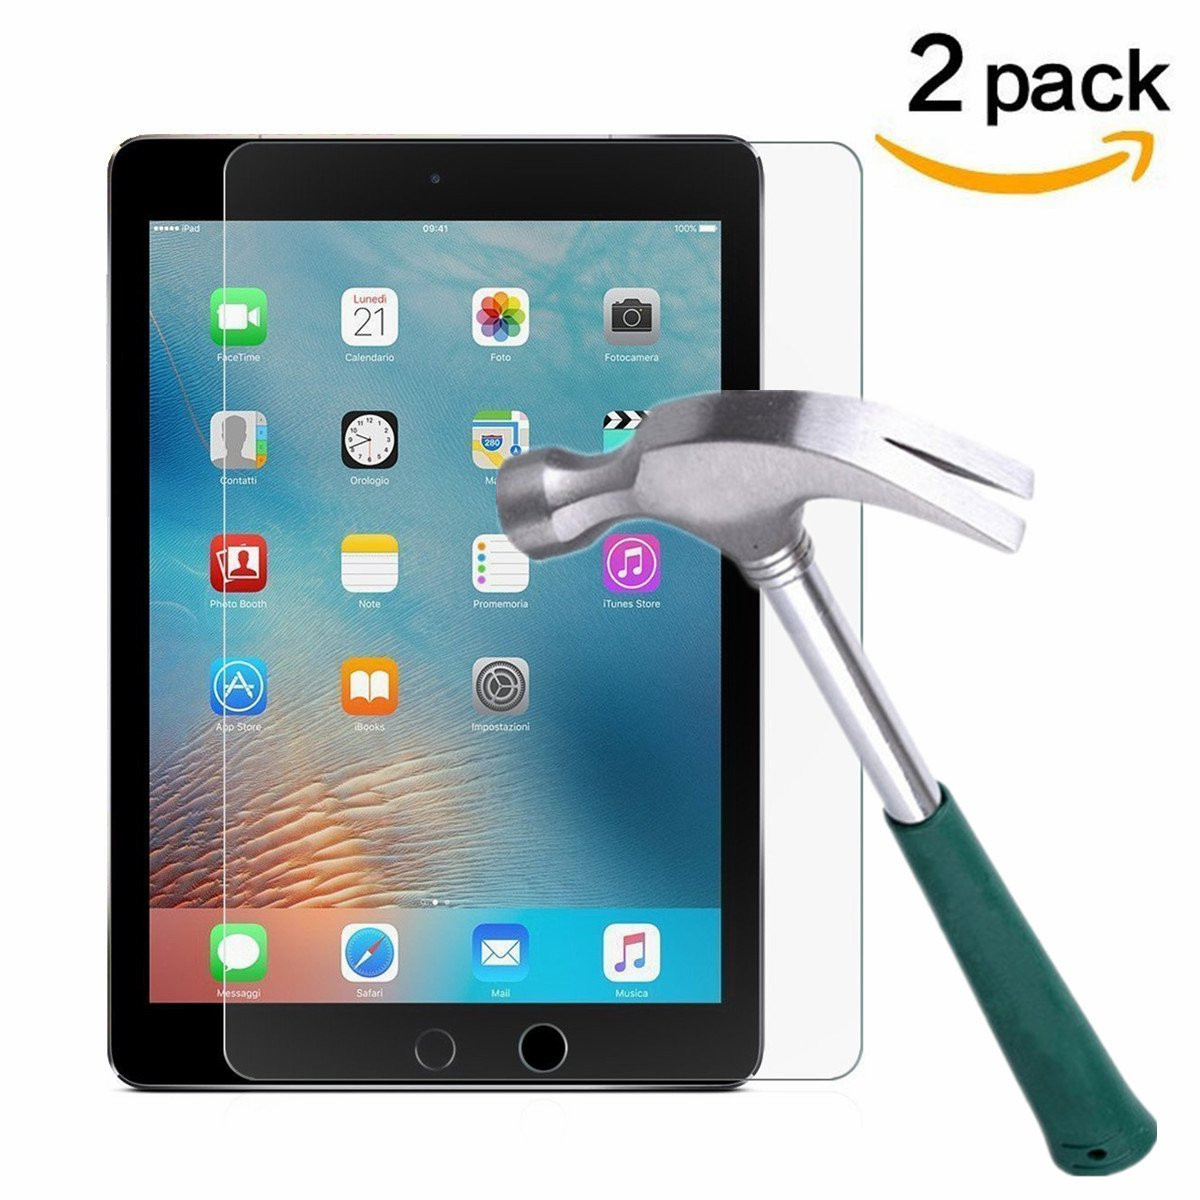 iPad 9.7'' (2017) / iPad Pro 9.7 / iPad Air 2 / iPad Air Screen Protector [2-Pack],TANTEK Tempered Glass Screen Protector- Apple Pencil Compatible / 2.5D Round Edge / Scratch Resistant